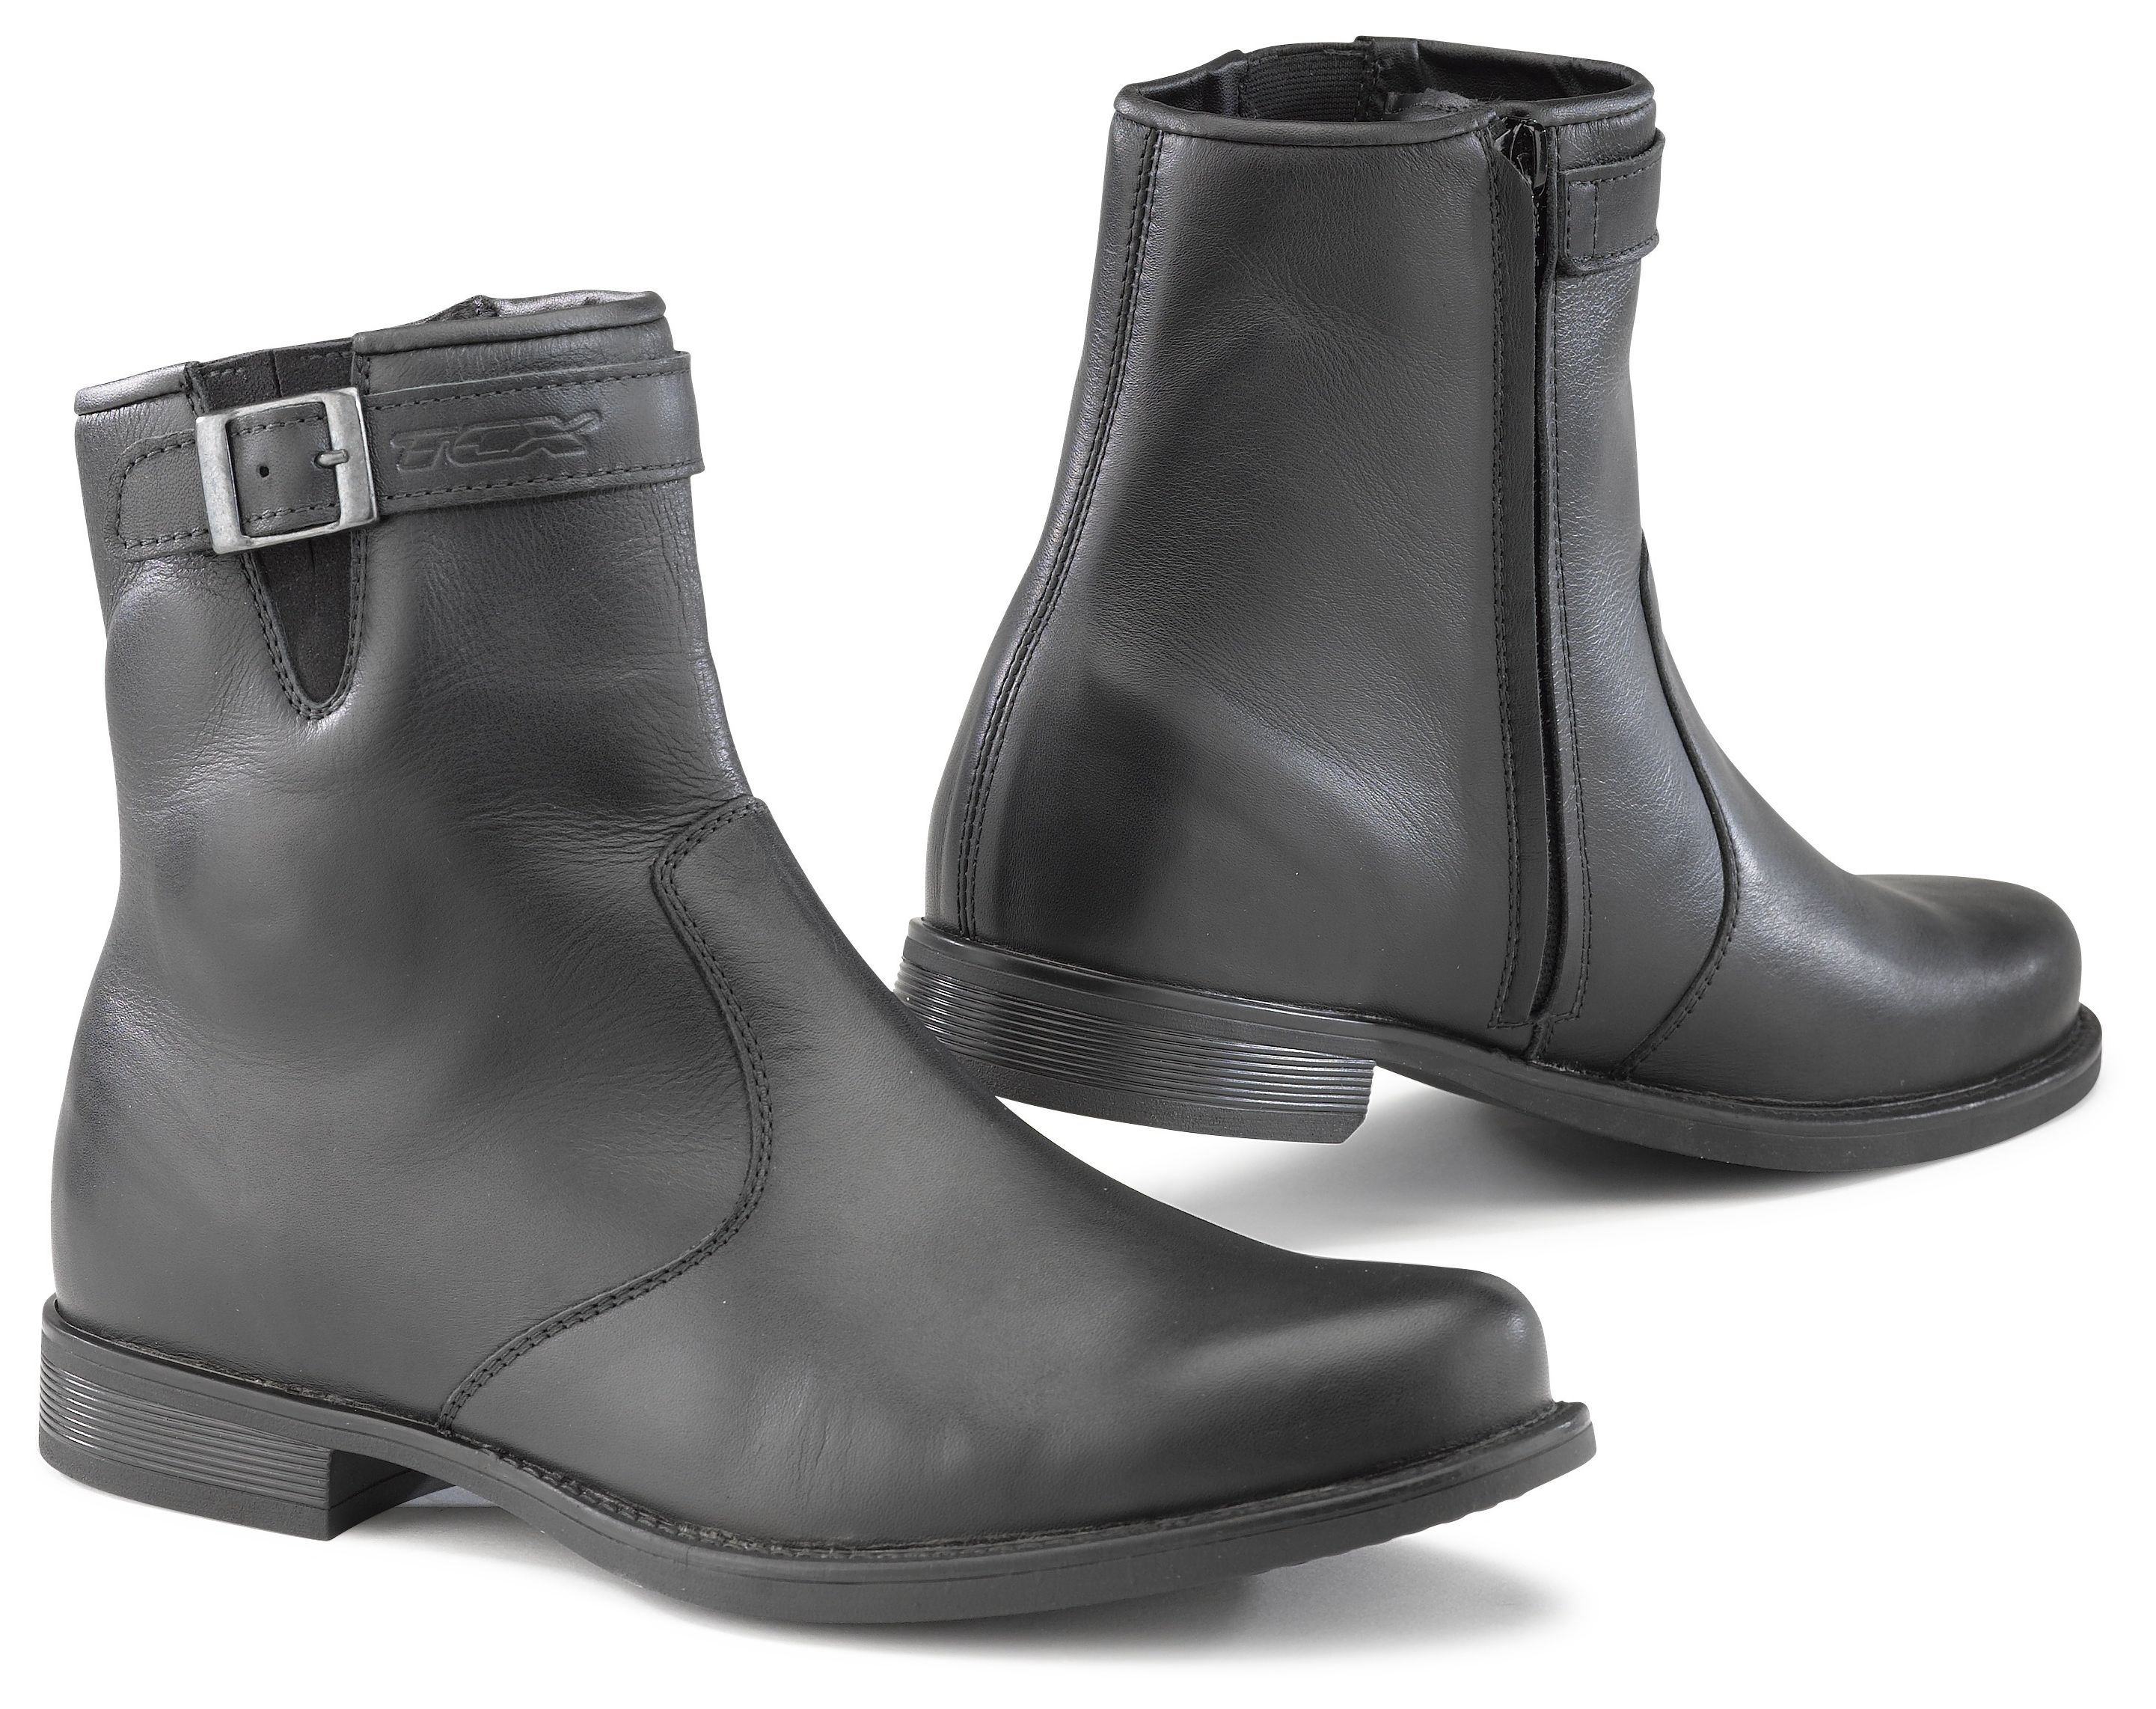 tcx x-avenue waterproof boots - revzilla xquudpl